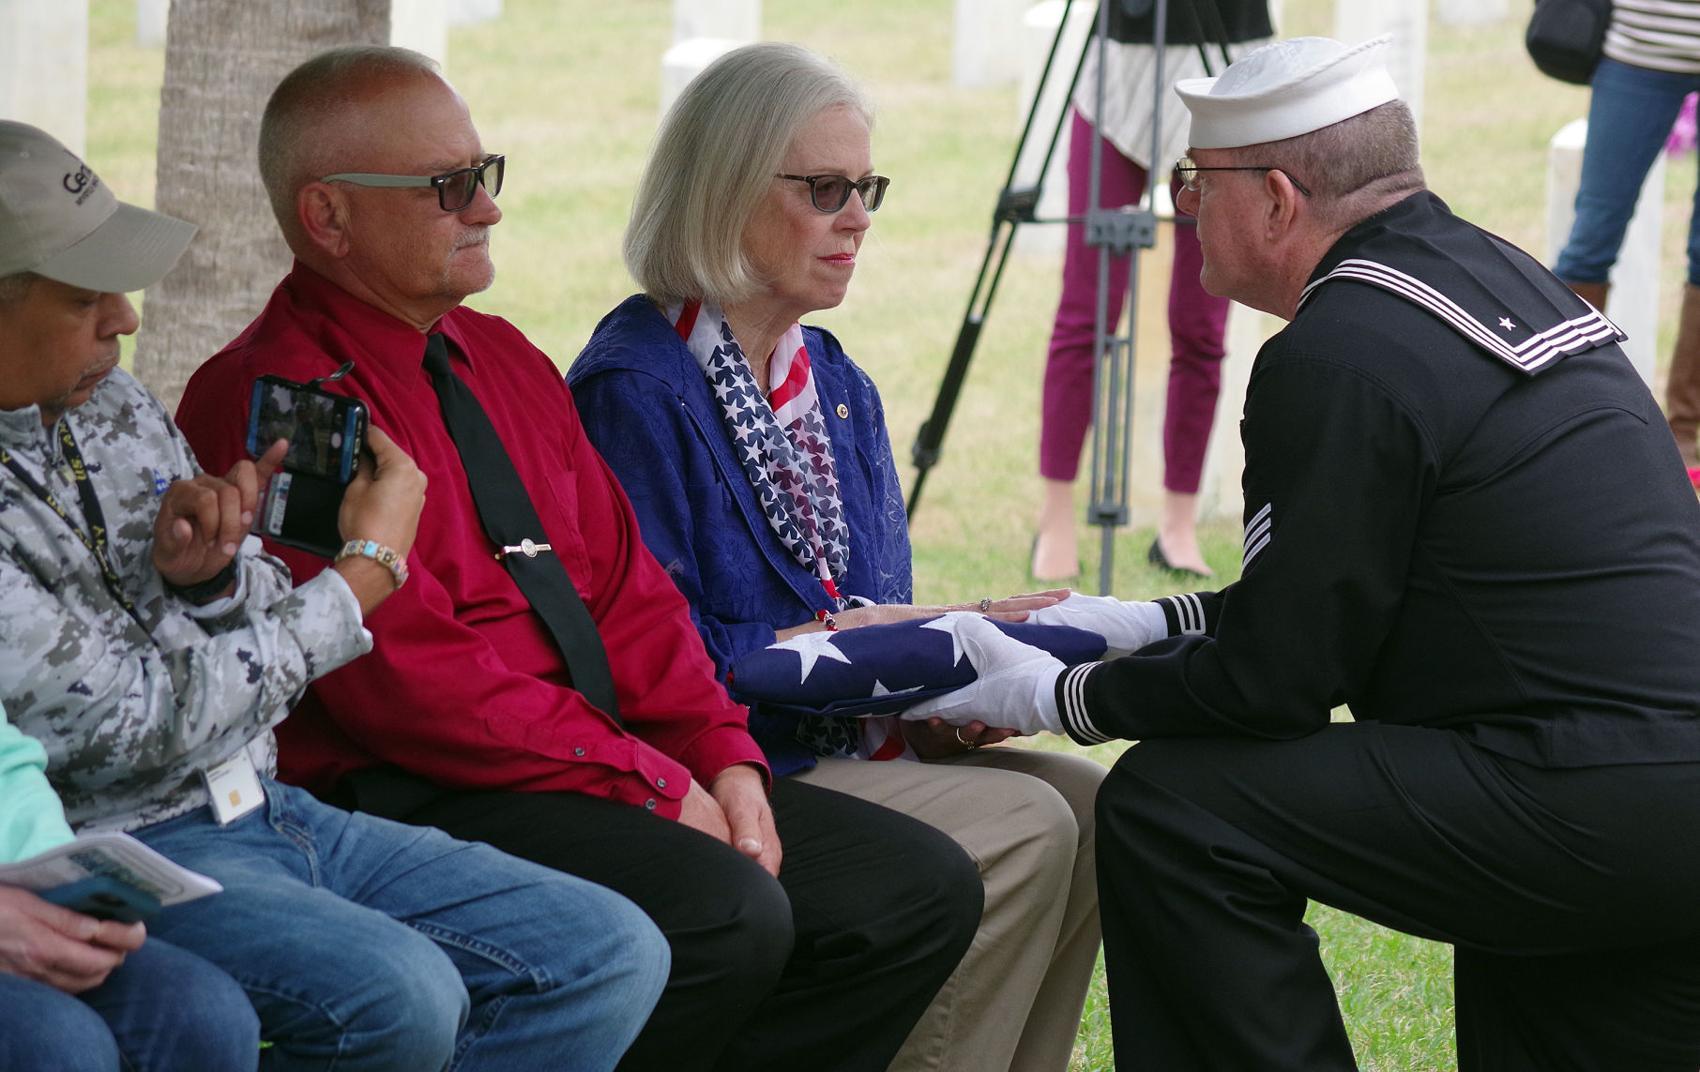 Florence Veterans Honor Guard Saturday conducts annual Veterans Memorial Tribute